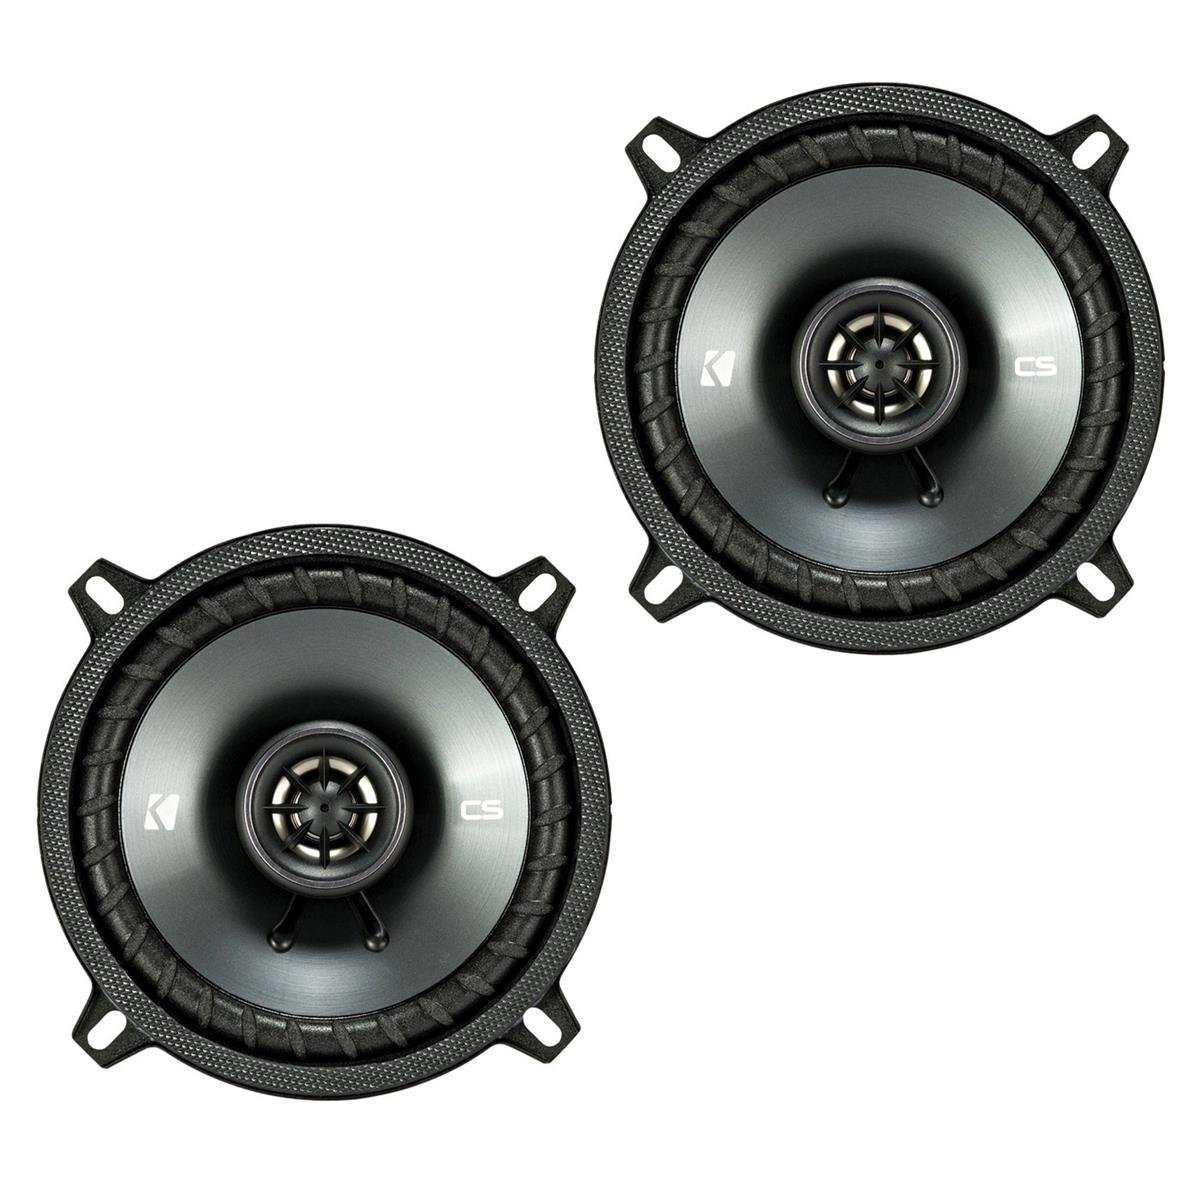 Kicker CSC5 5.25'' 225W 2 Way 4 Ohm Coaxial Car Audio Speakers, Pair | 43CSC54